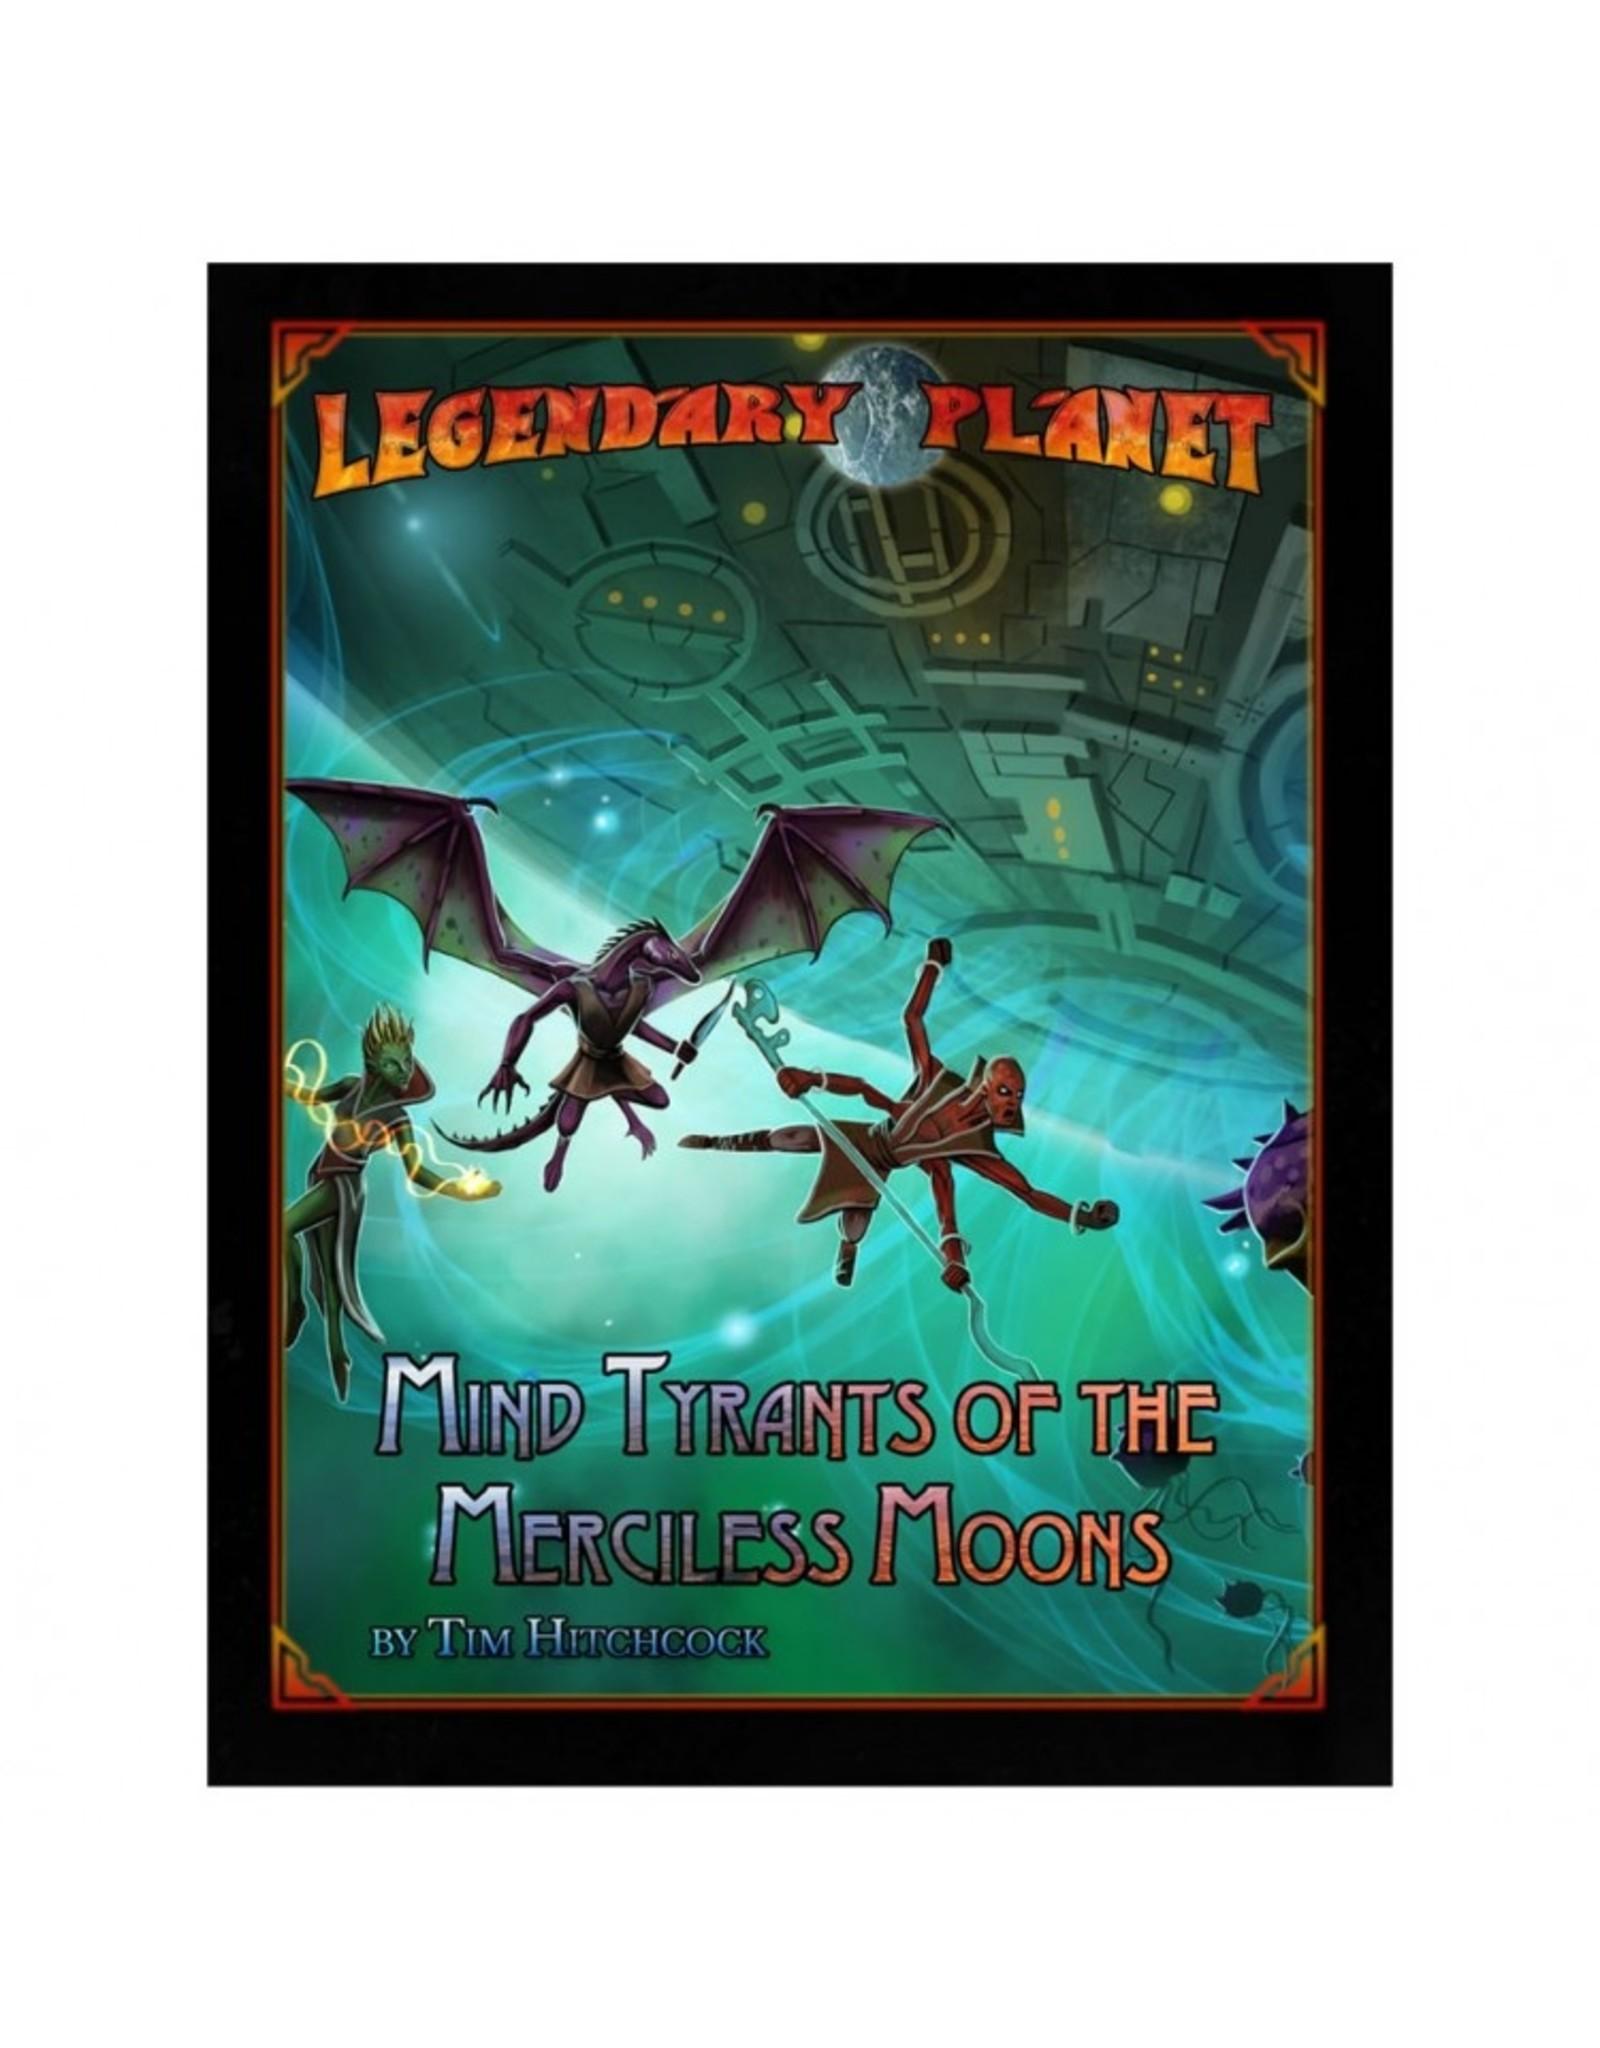 5E: LP: Mind Tyrants of the Merciless Moons